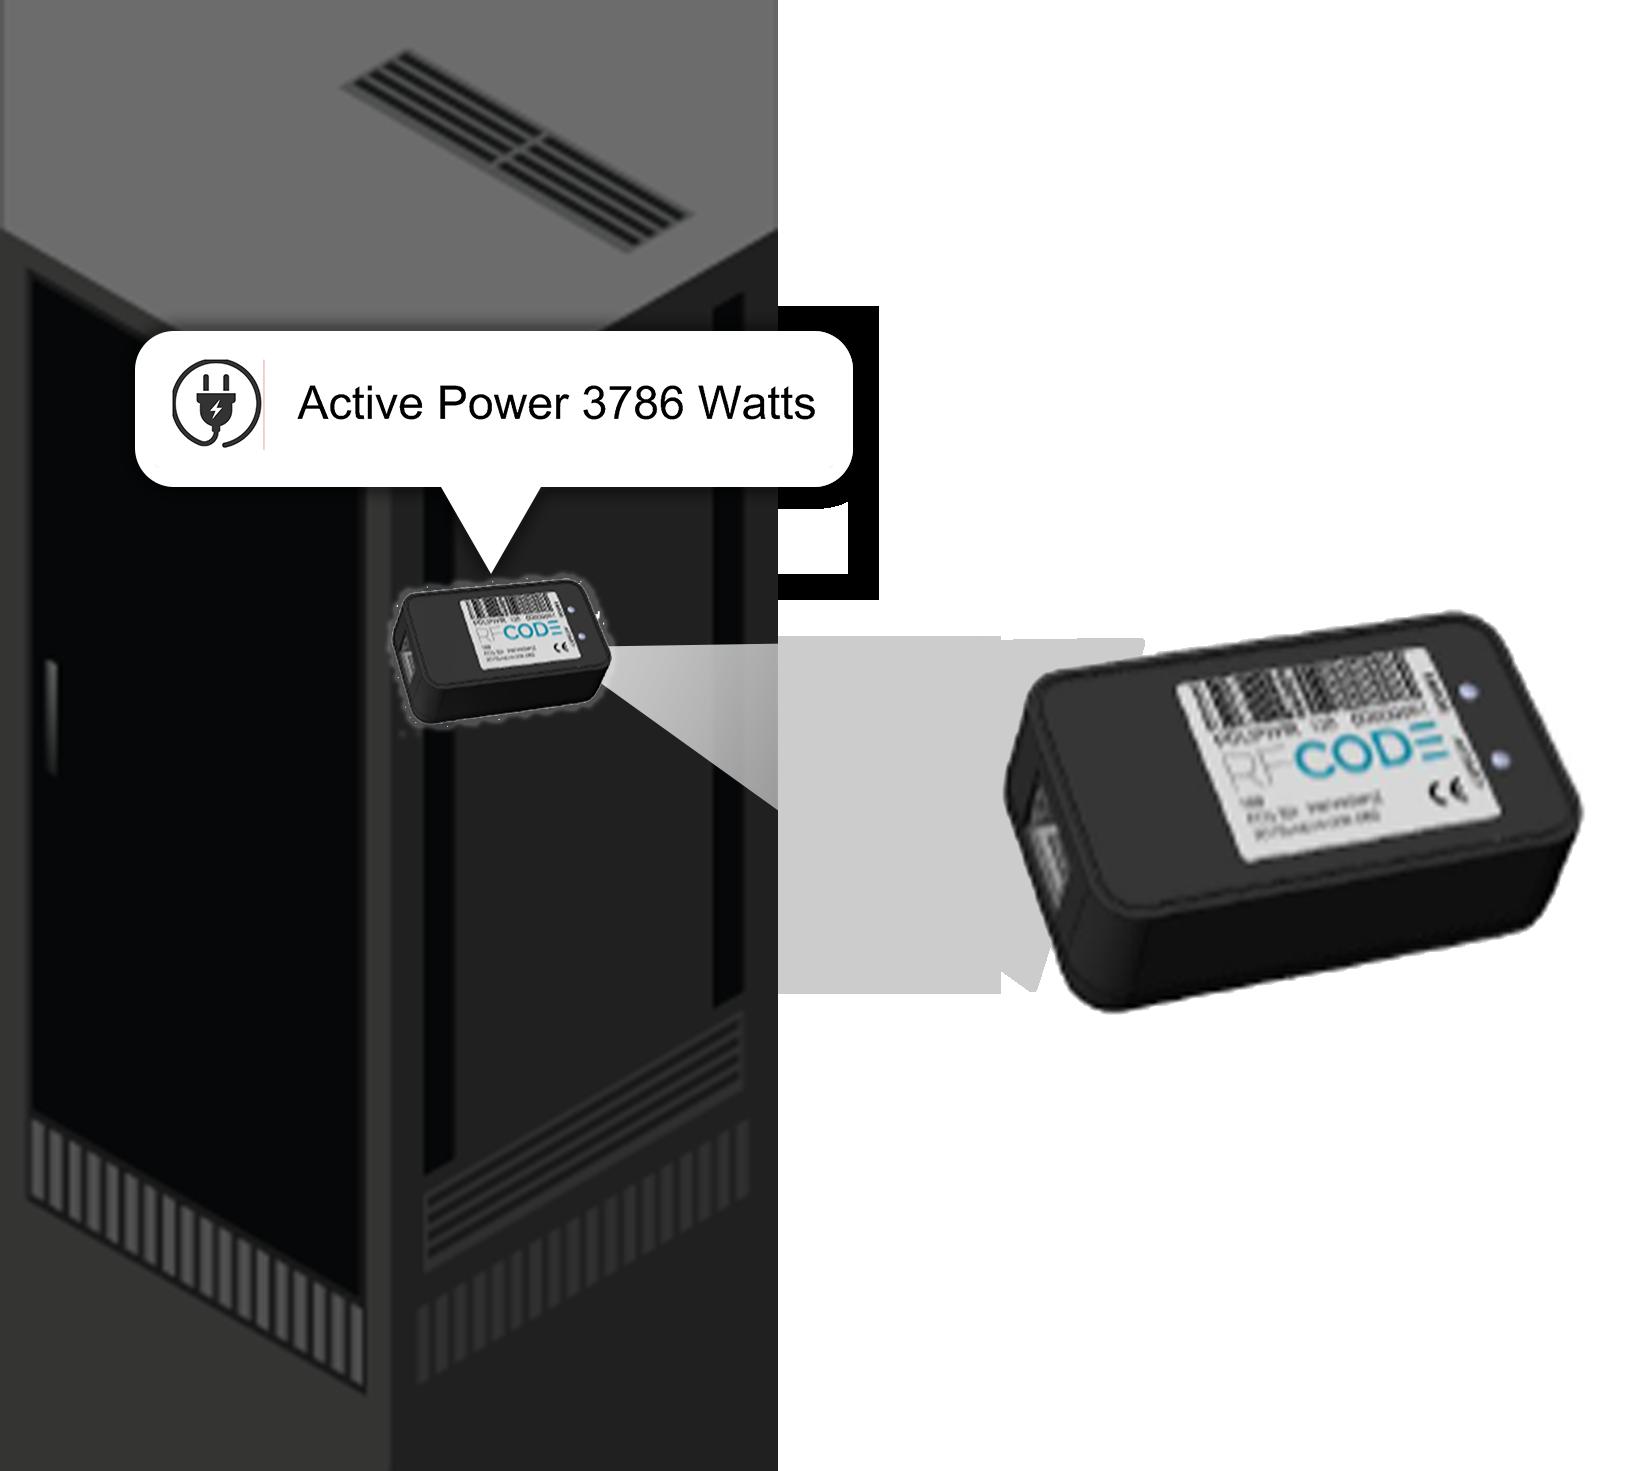 rack-pdu-power-illustration